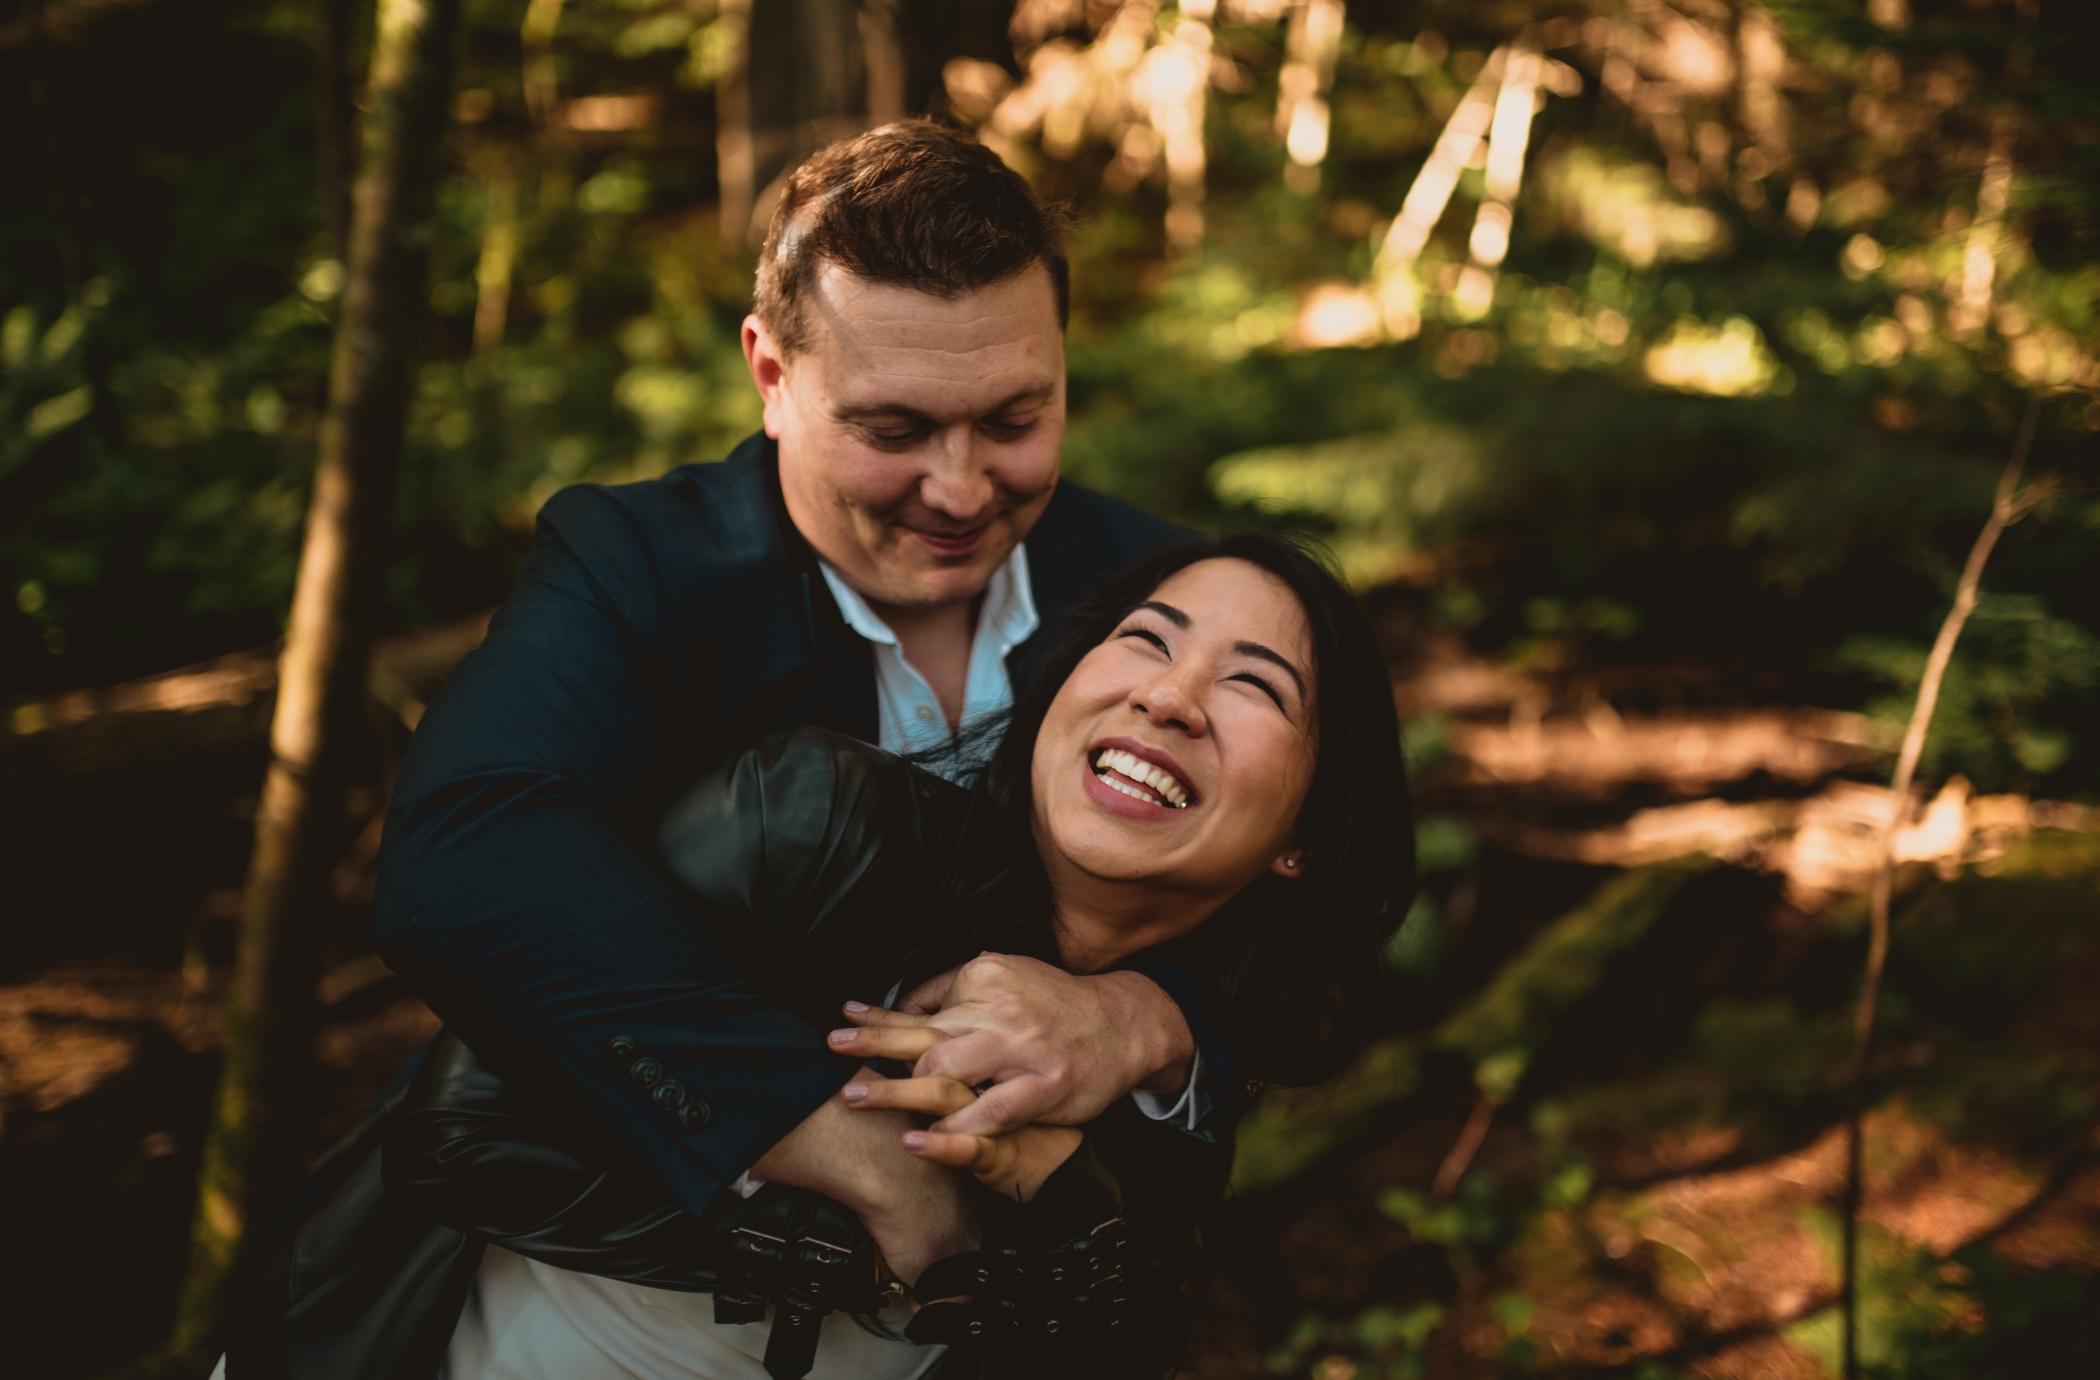 Dark and Moody Wedding photographer Vancouver BC049.jpg